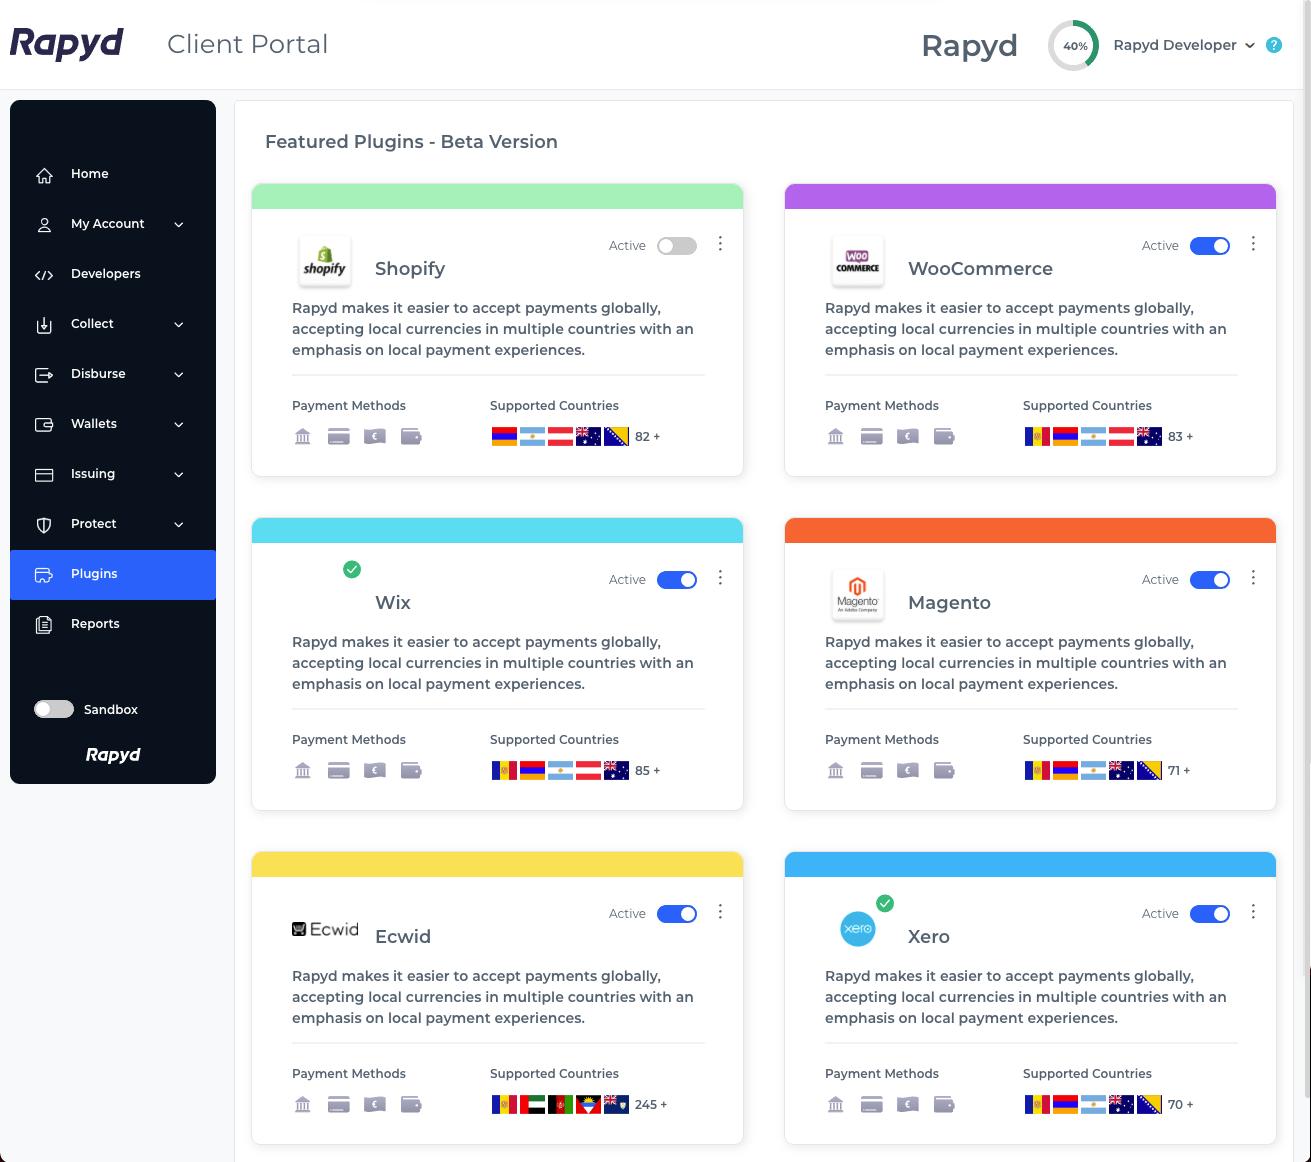 Plugins in Client Portal